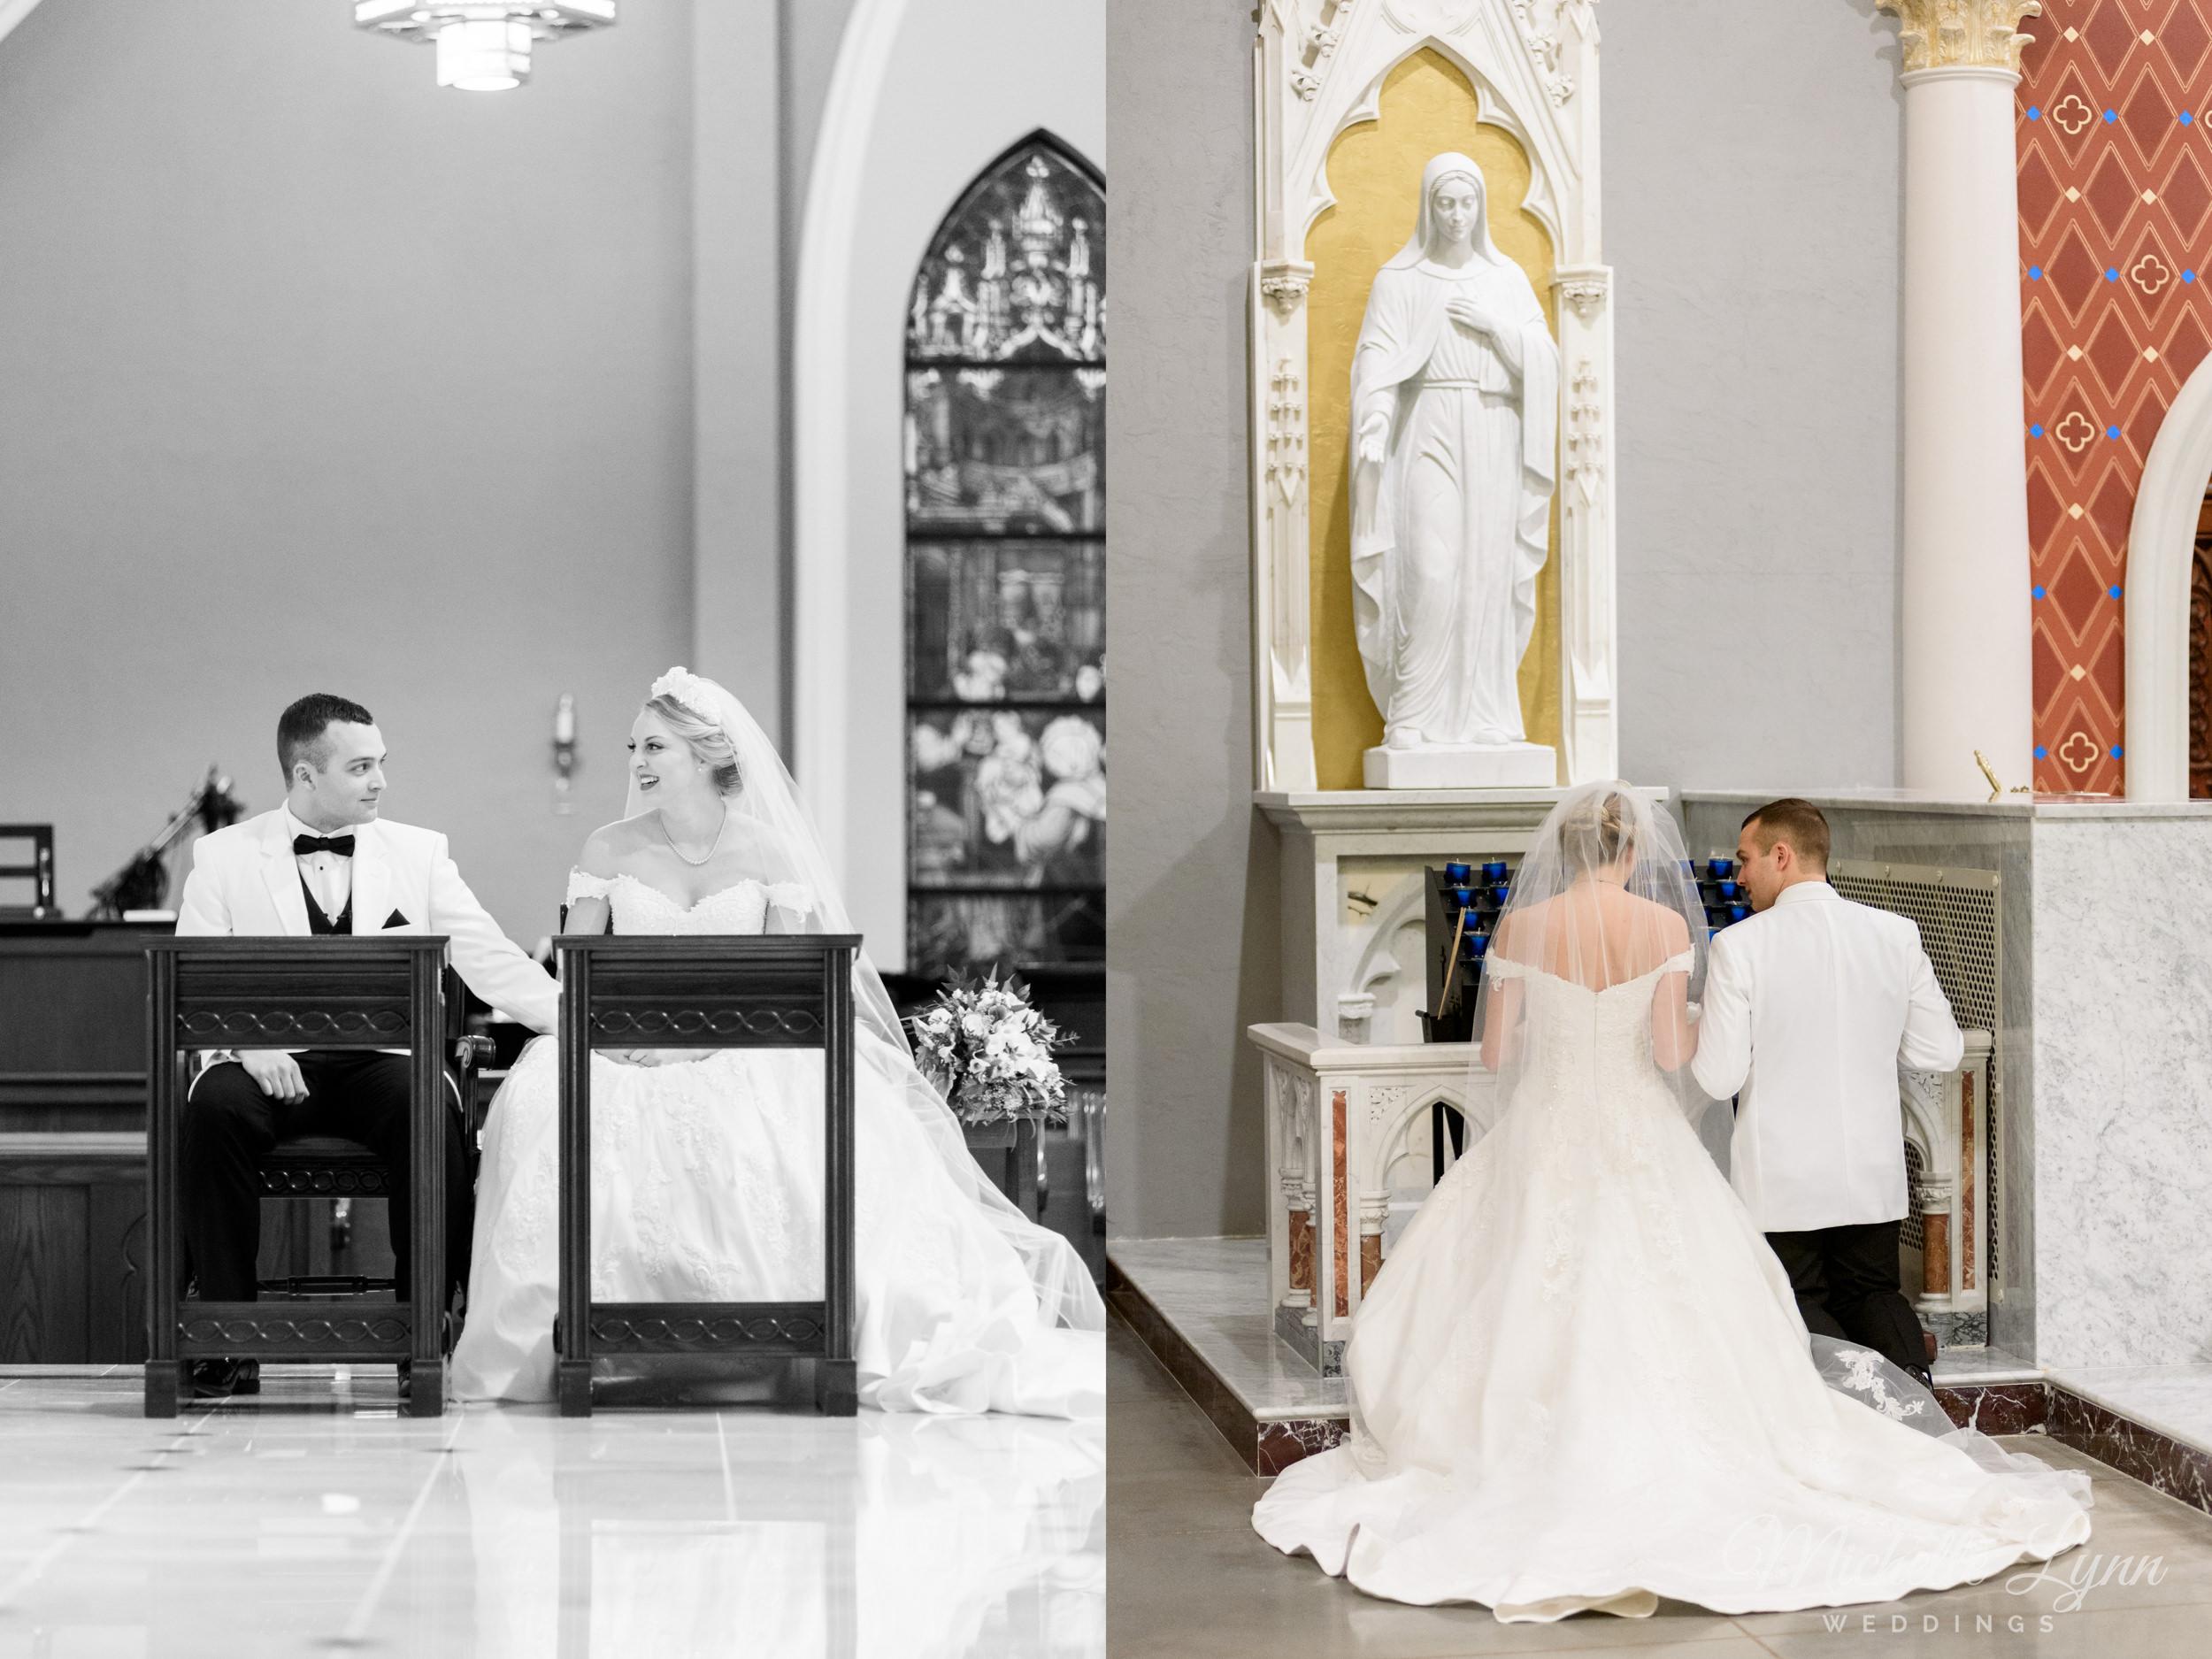 william-penn-inn-wedding-photography-mlw-62.jpg